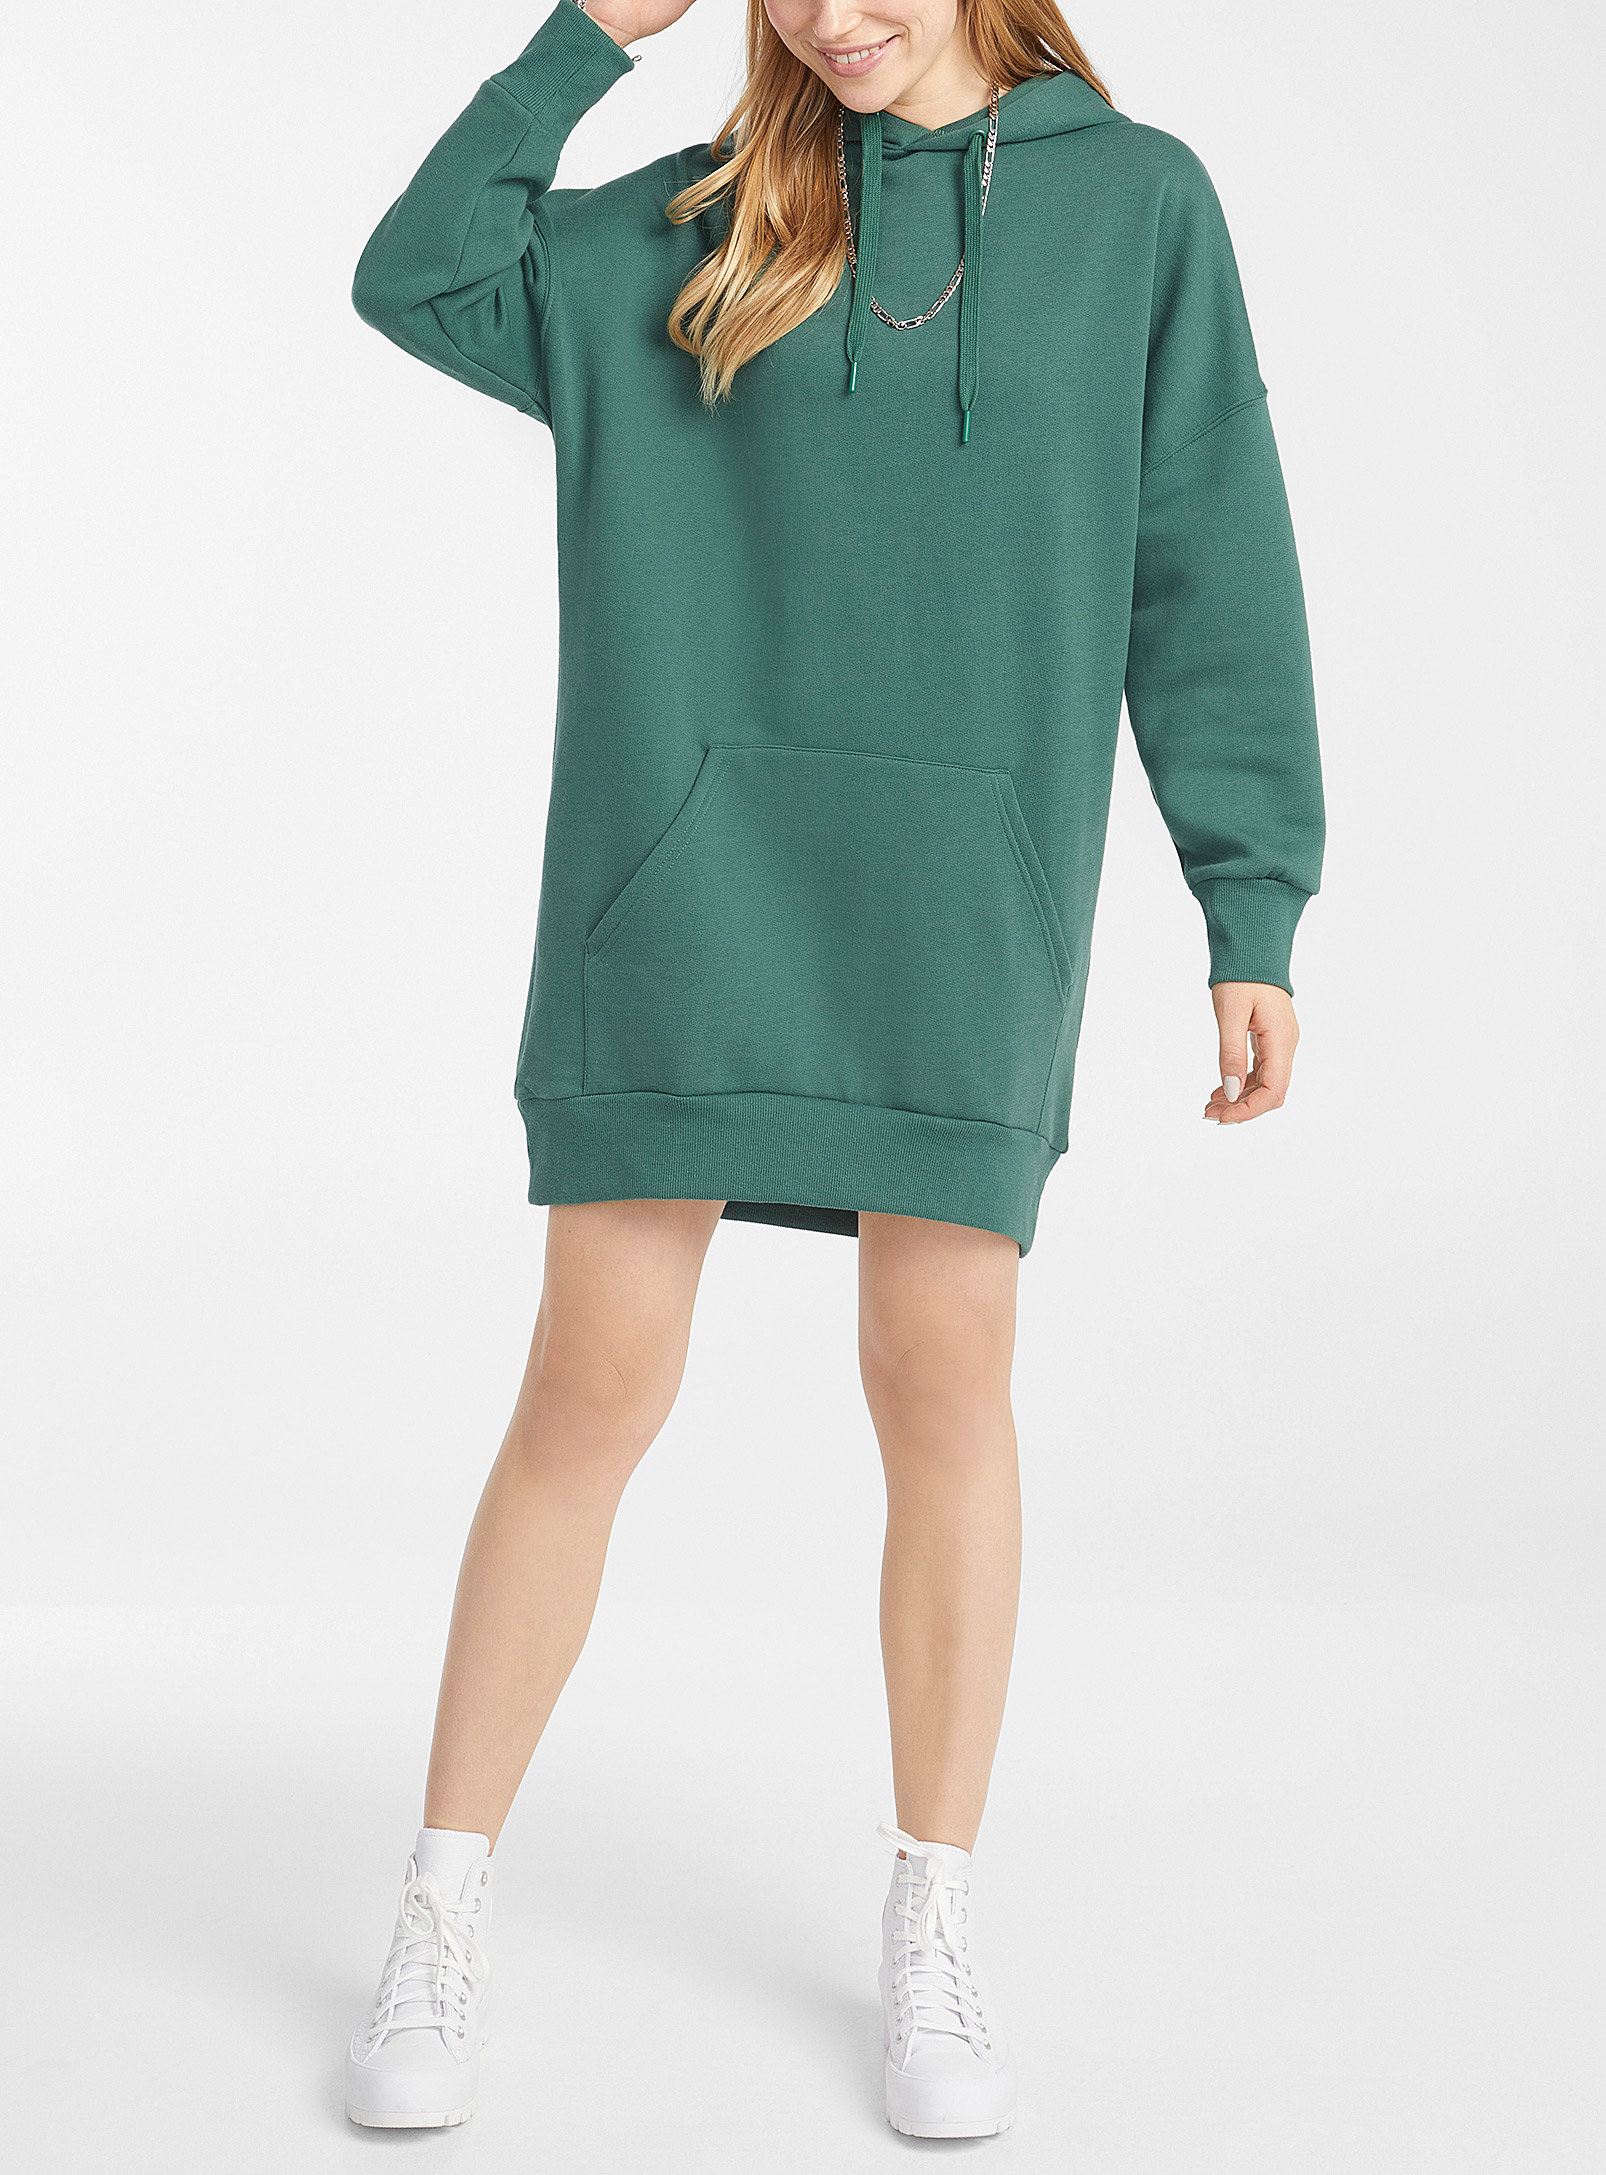 A person wearing a knee length sweatshirt dress